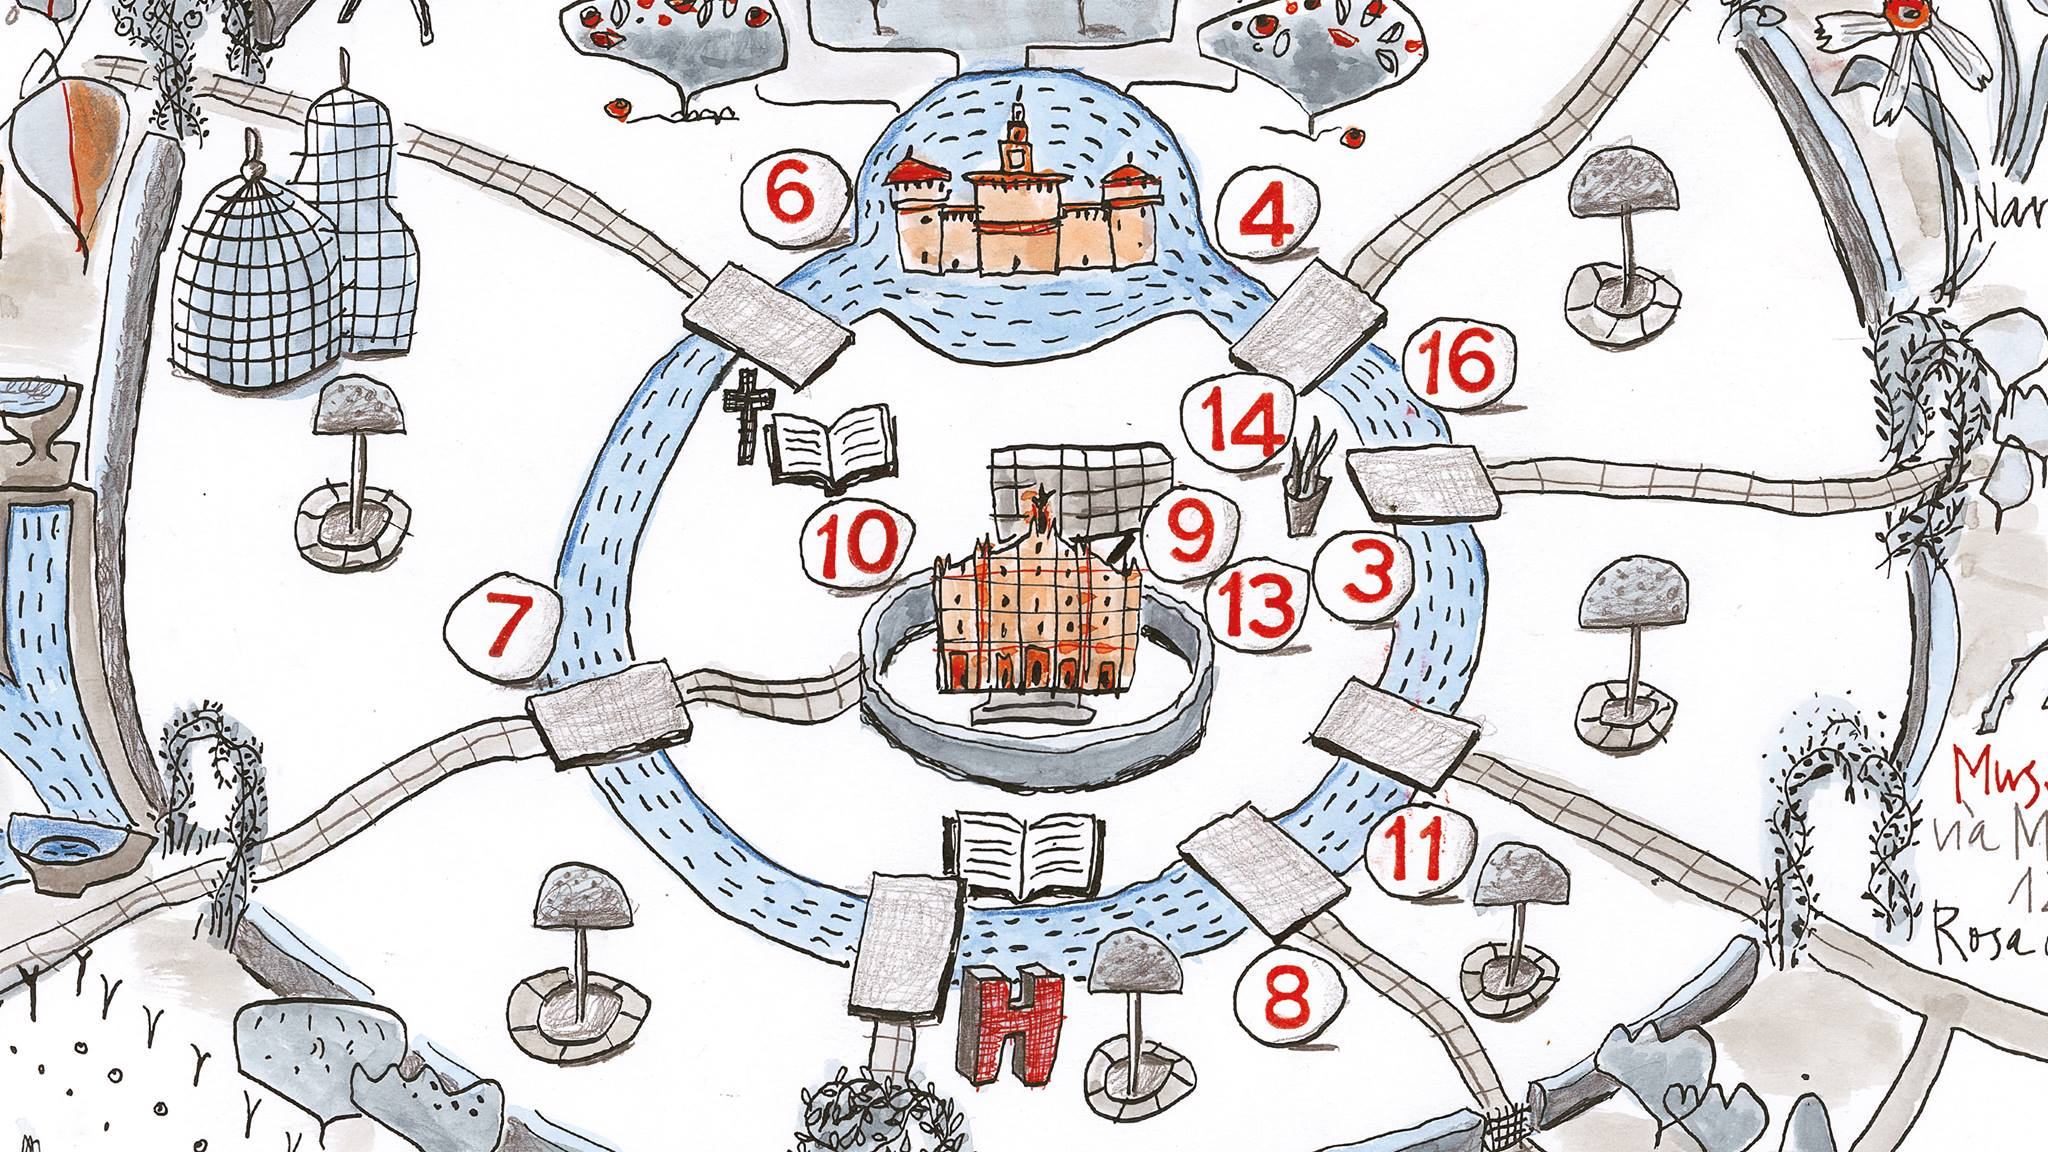 Visite guidate gratuite a 16 luoghi milanesi